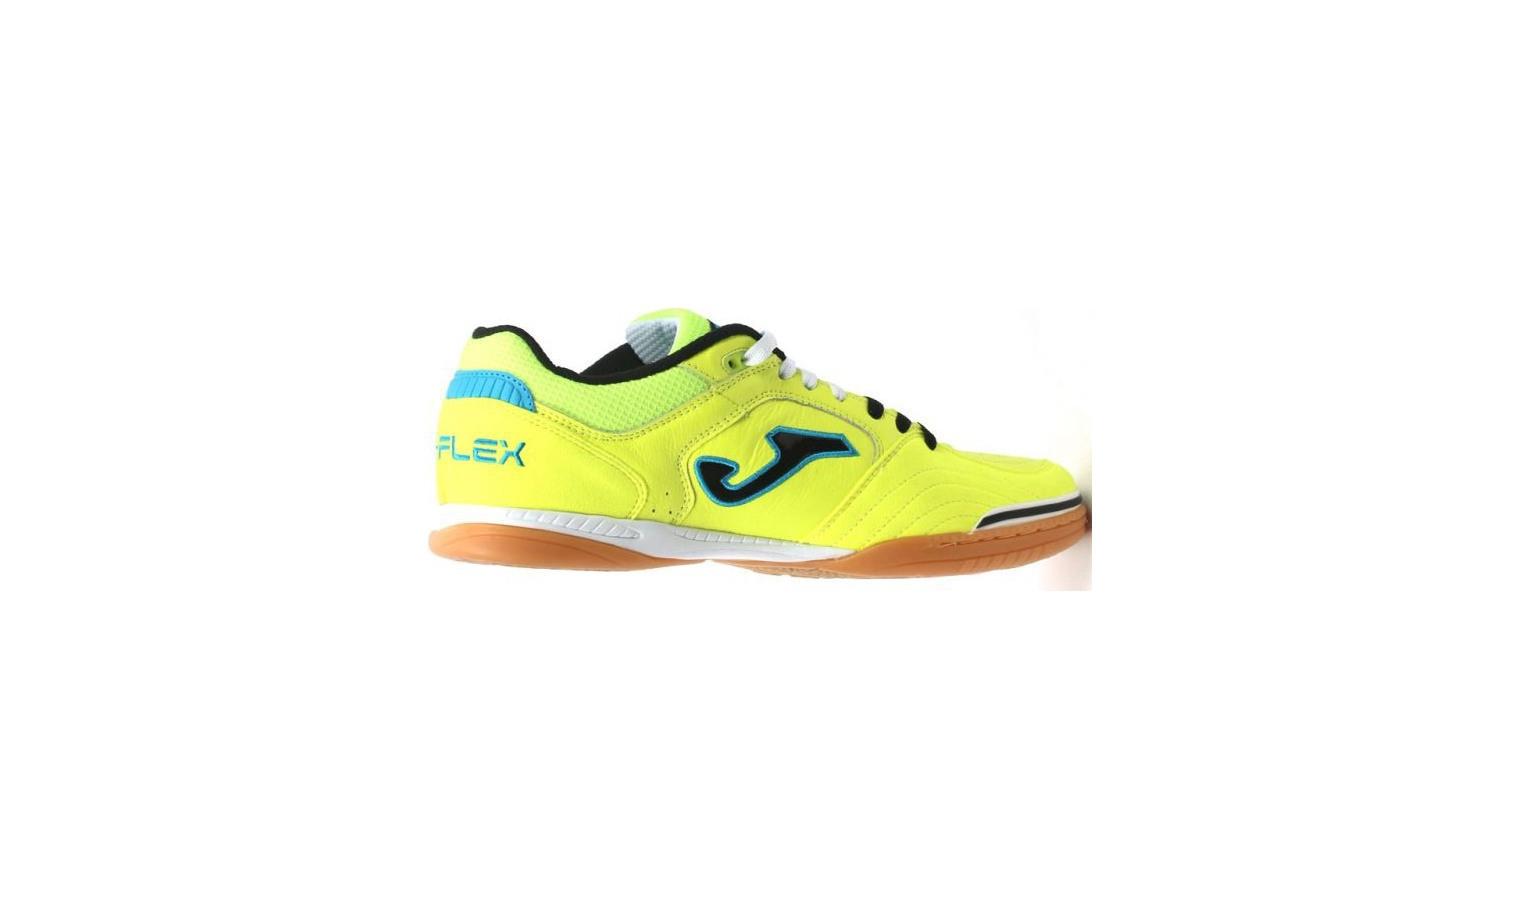 5e96f8676d1e0 Halovky Joma TOP FLEX 509 žlté | AD Sport.sk